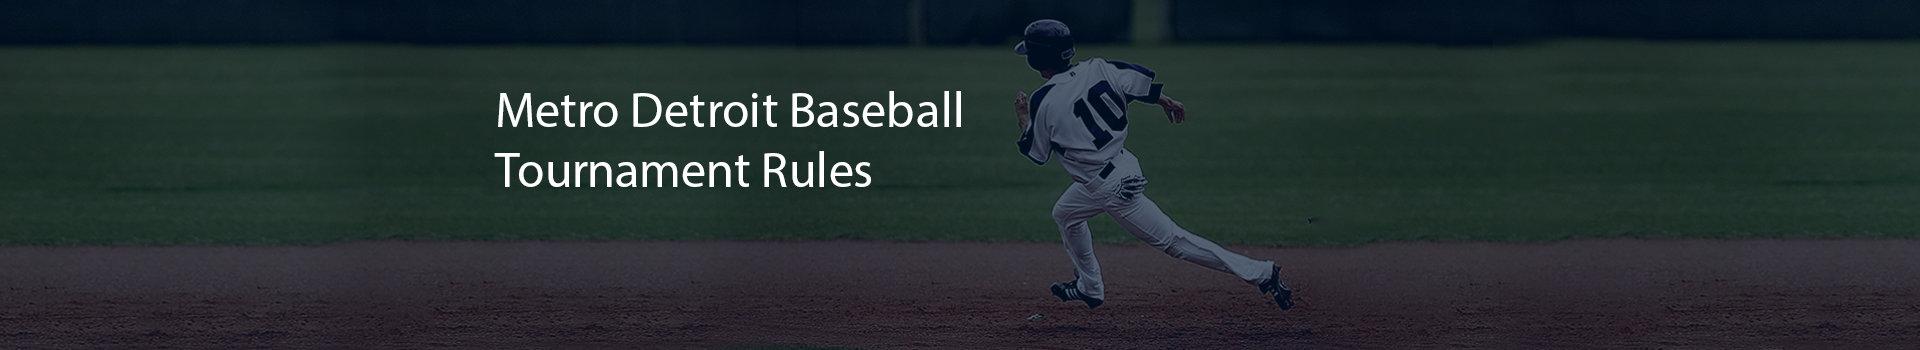 Tournament rules web banner.jpg